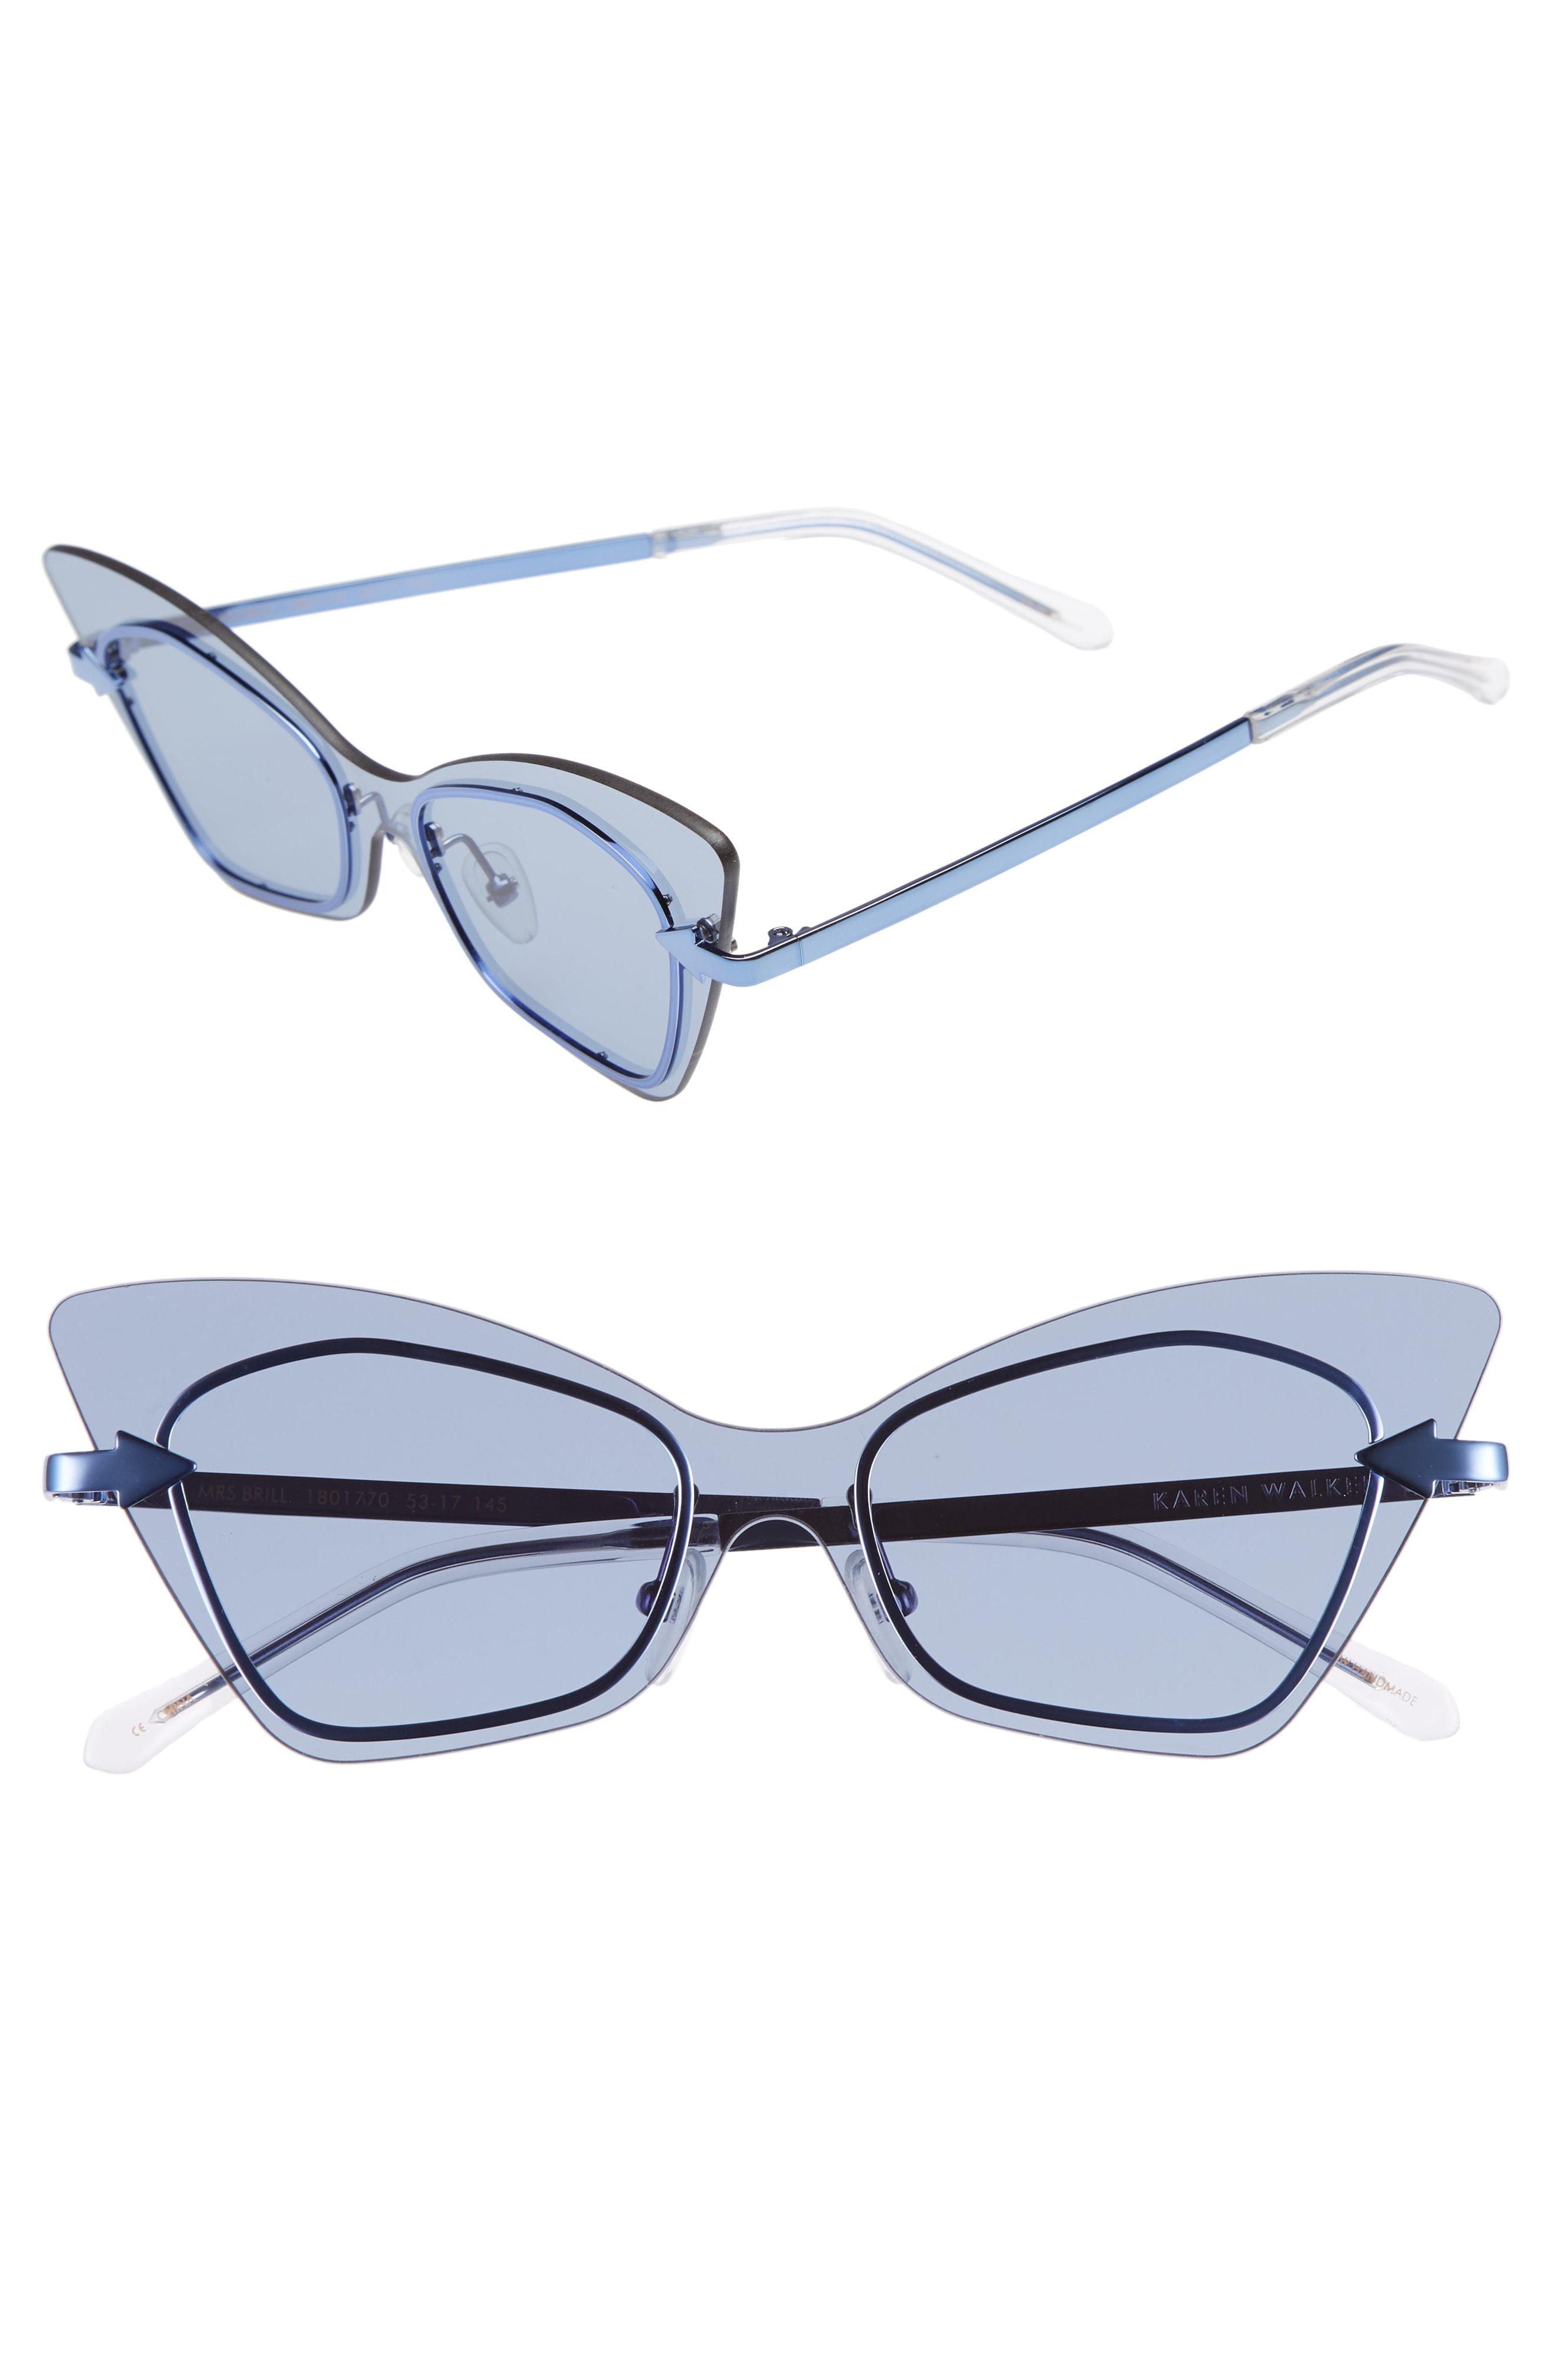 2c64a34e3589 Lyst - Karen Walker Mrs. Brill 53mm Cat Eye Sunglasses - Clear in Blue